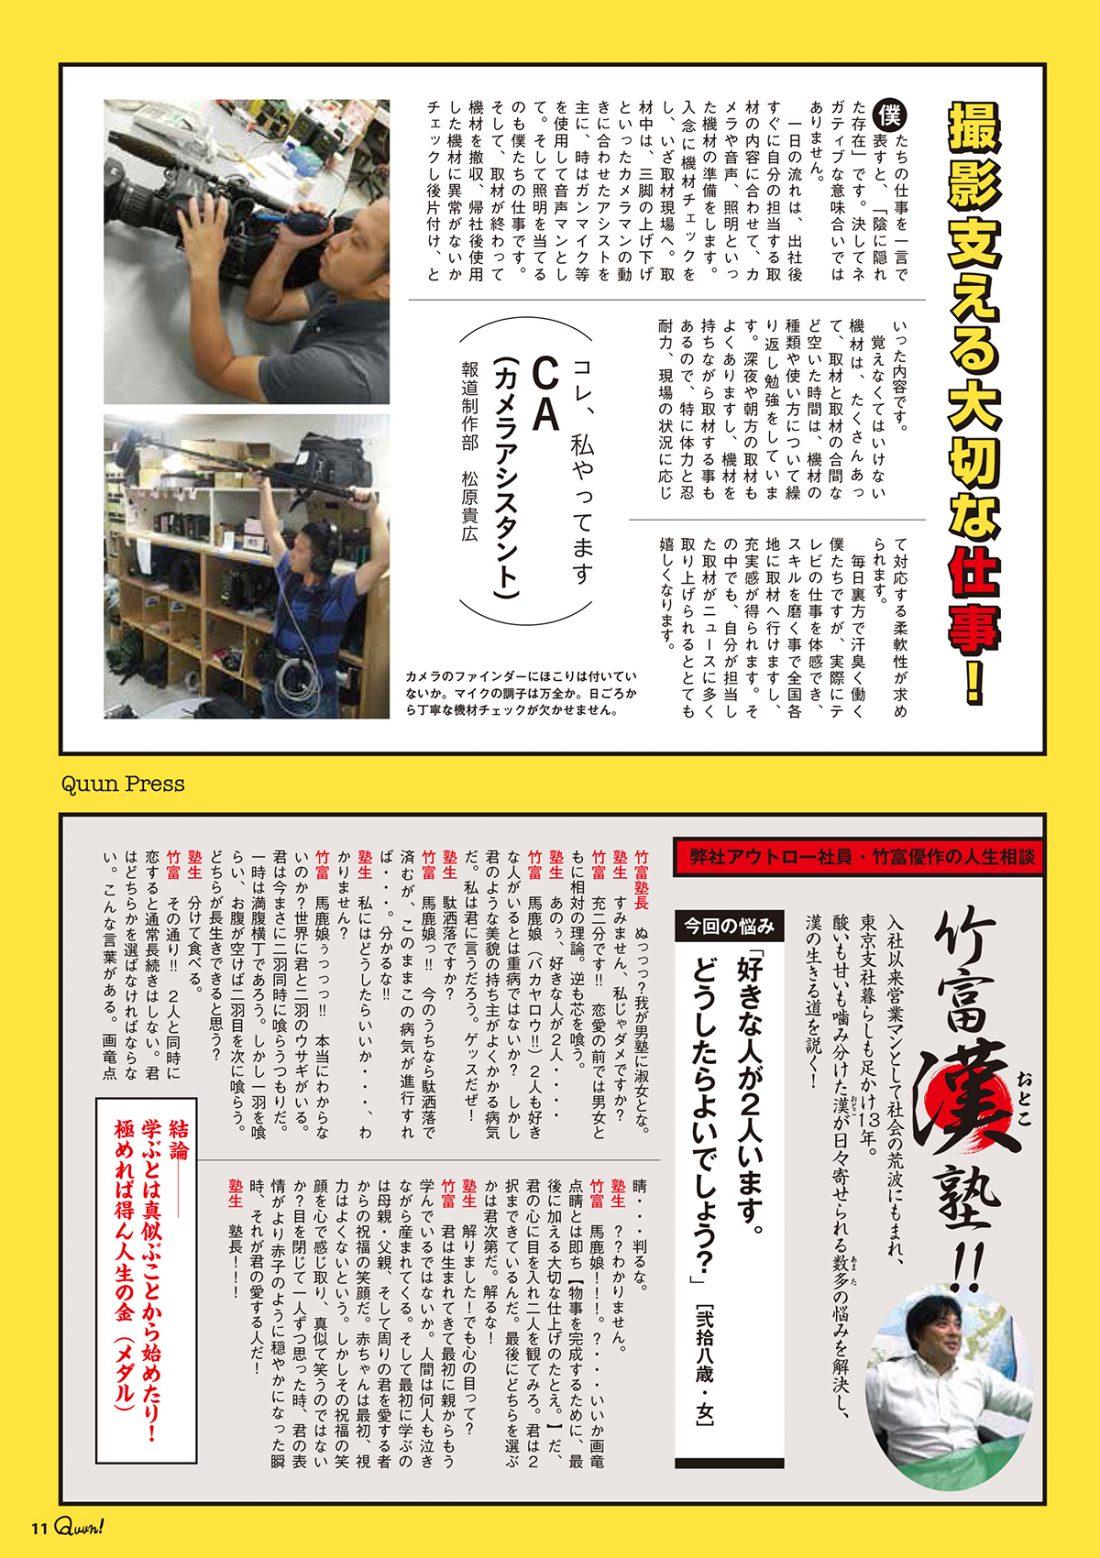 http://www.qab.co.jp/qgoro/wp-content/uploads/quun_0613-1100x1558.jpg